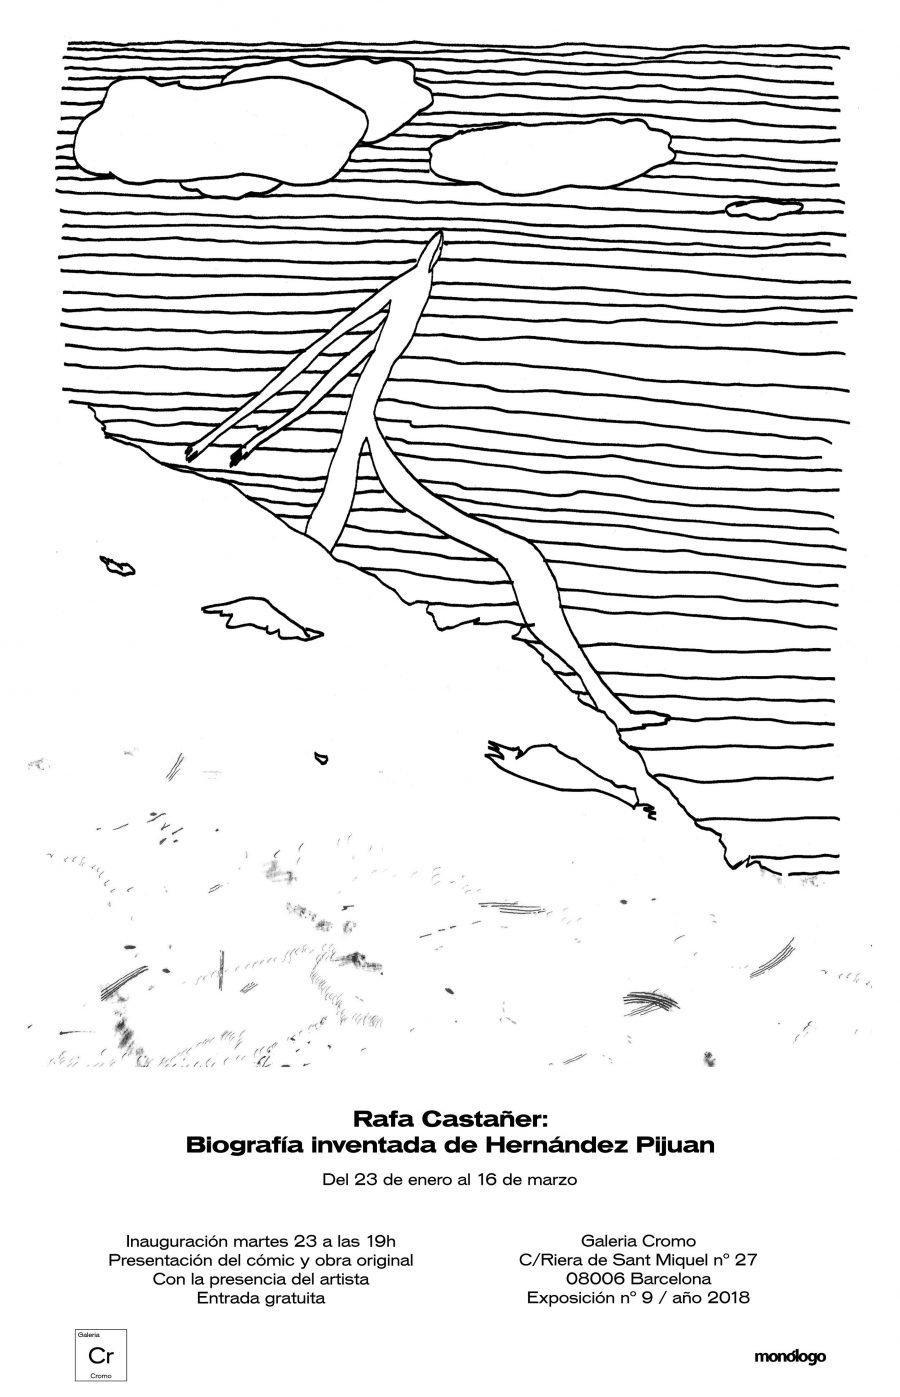 Rafa Castañer - Biografía inventada de Hernández Pijuan